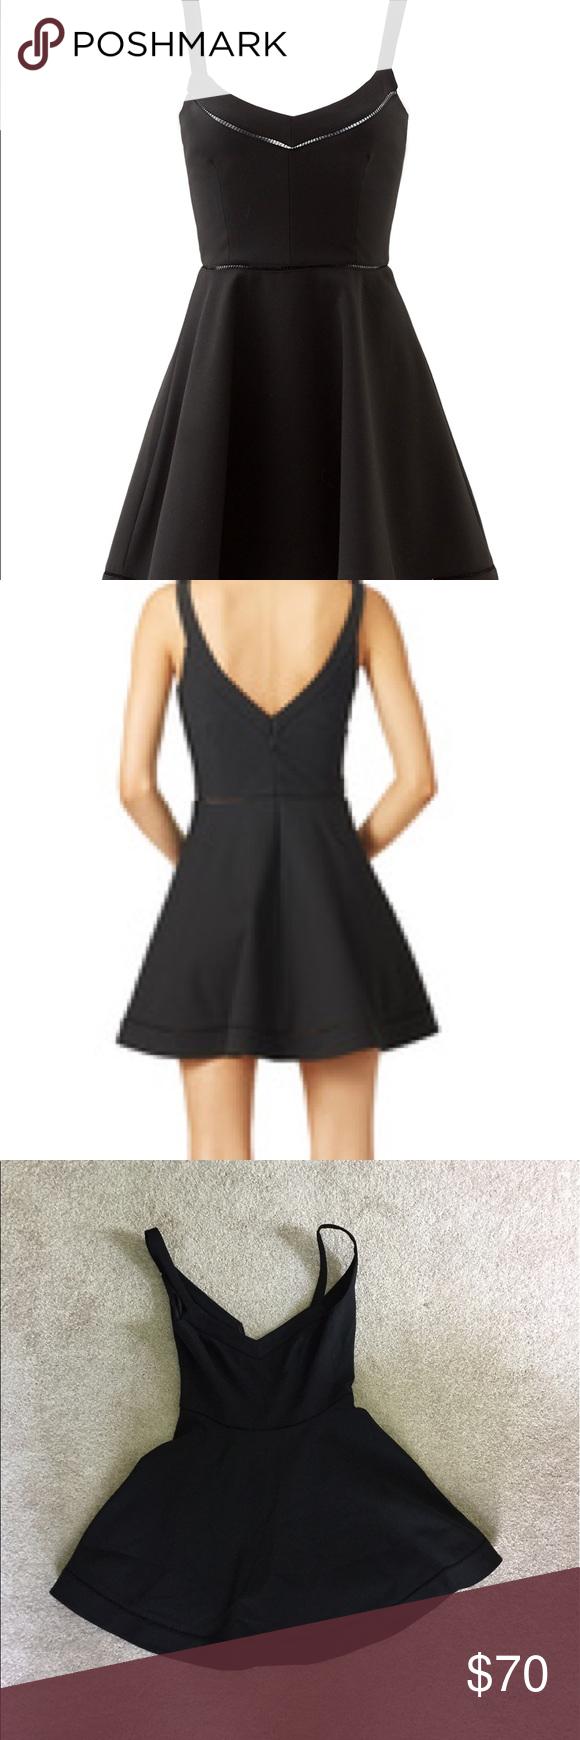 Nwot Elizabeth And James Cecil Dress Sz 4 Size Fit This Runs True